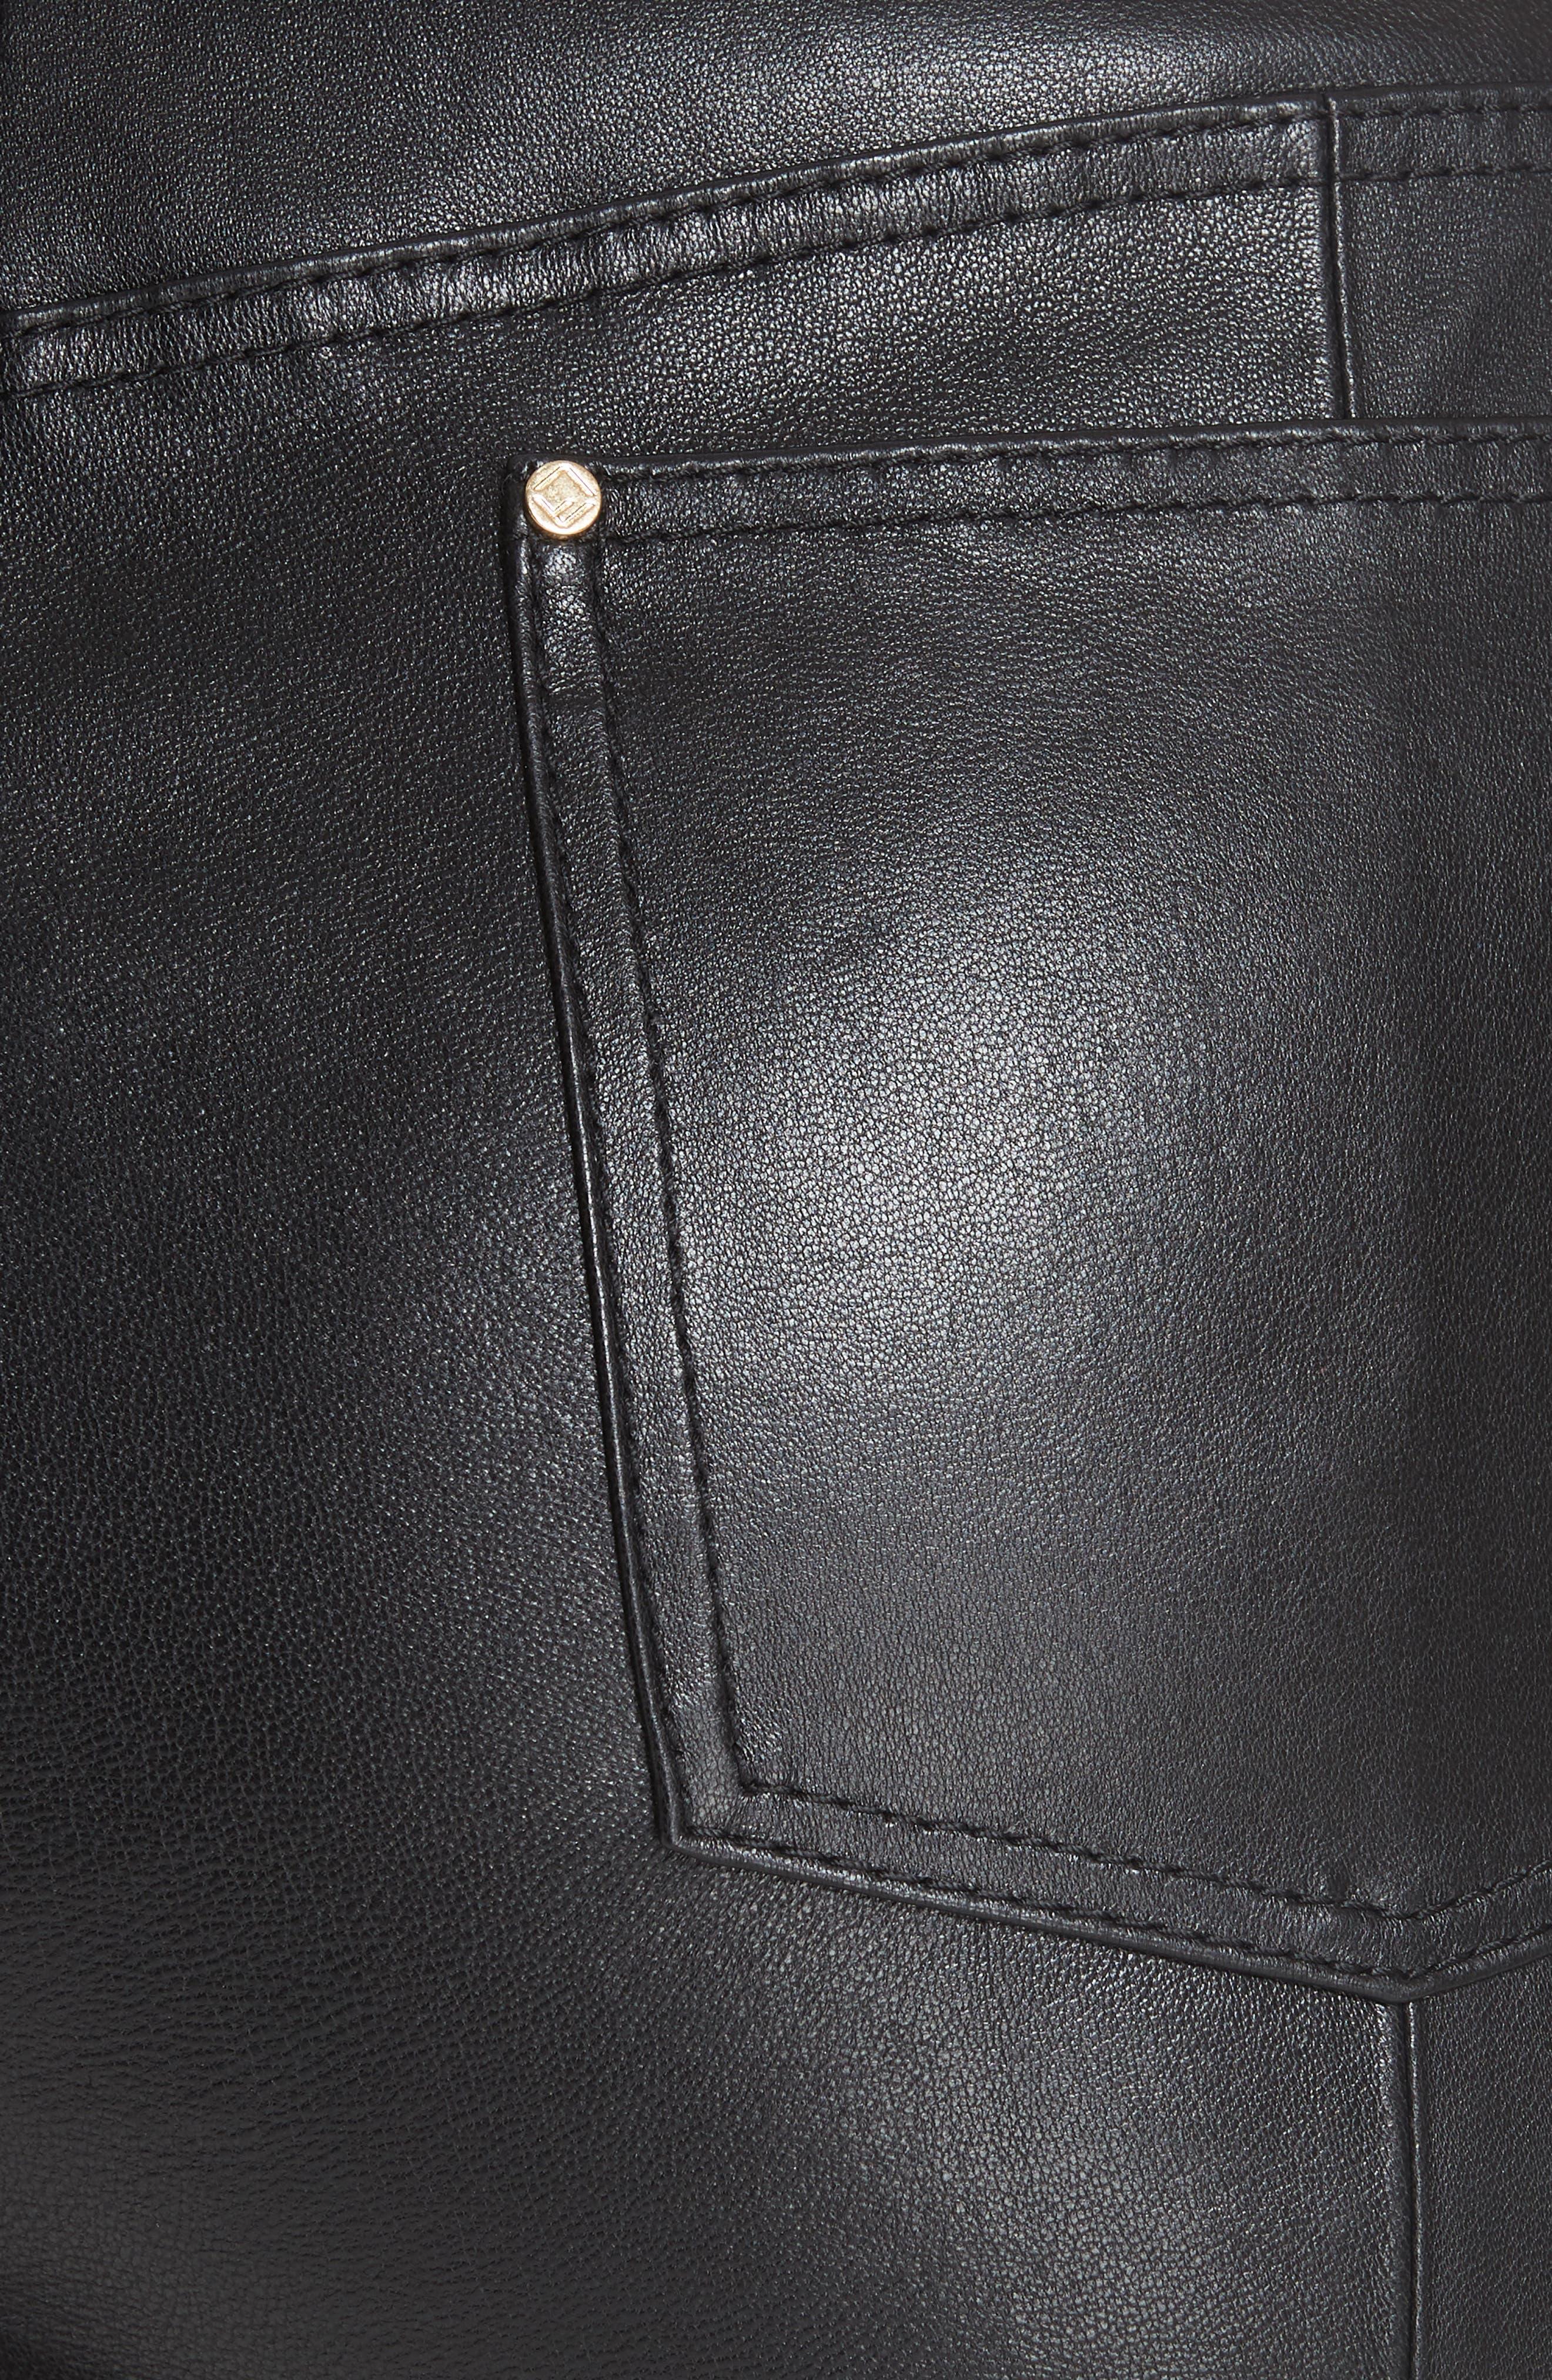 Mercer Nappa Leather Pants,                             Alternate thumbnail 5, color,                             BLACK